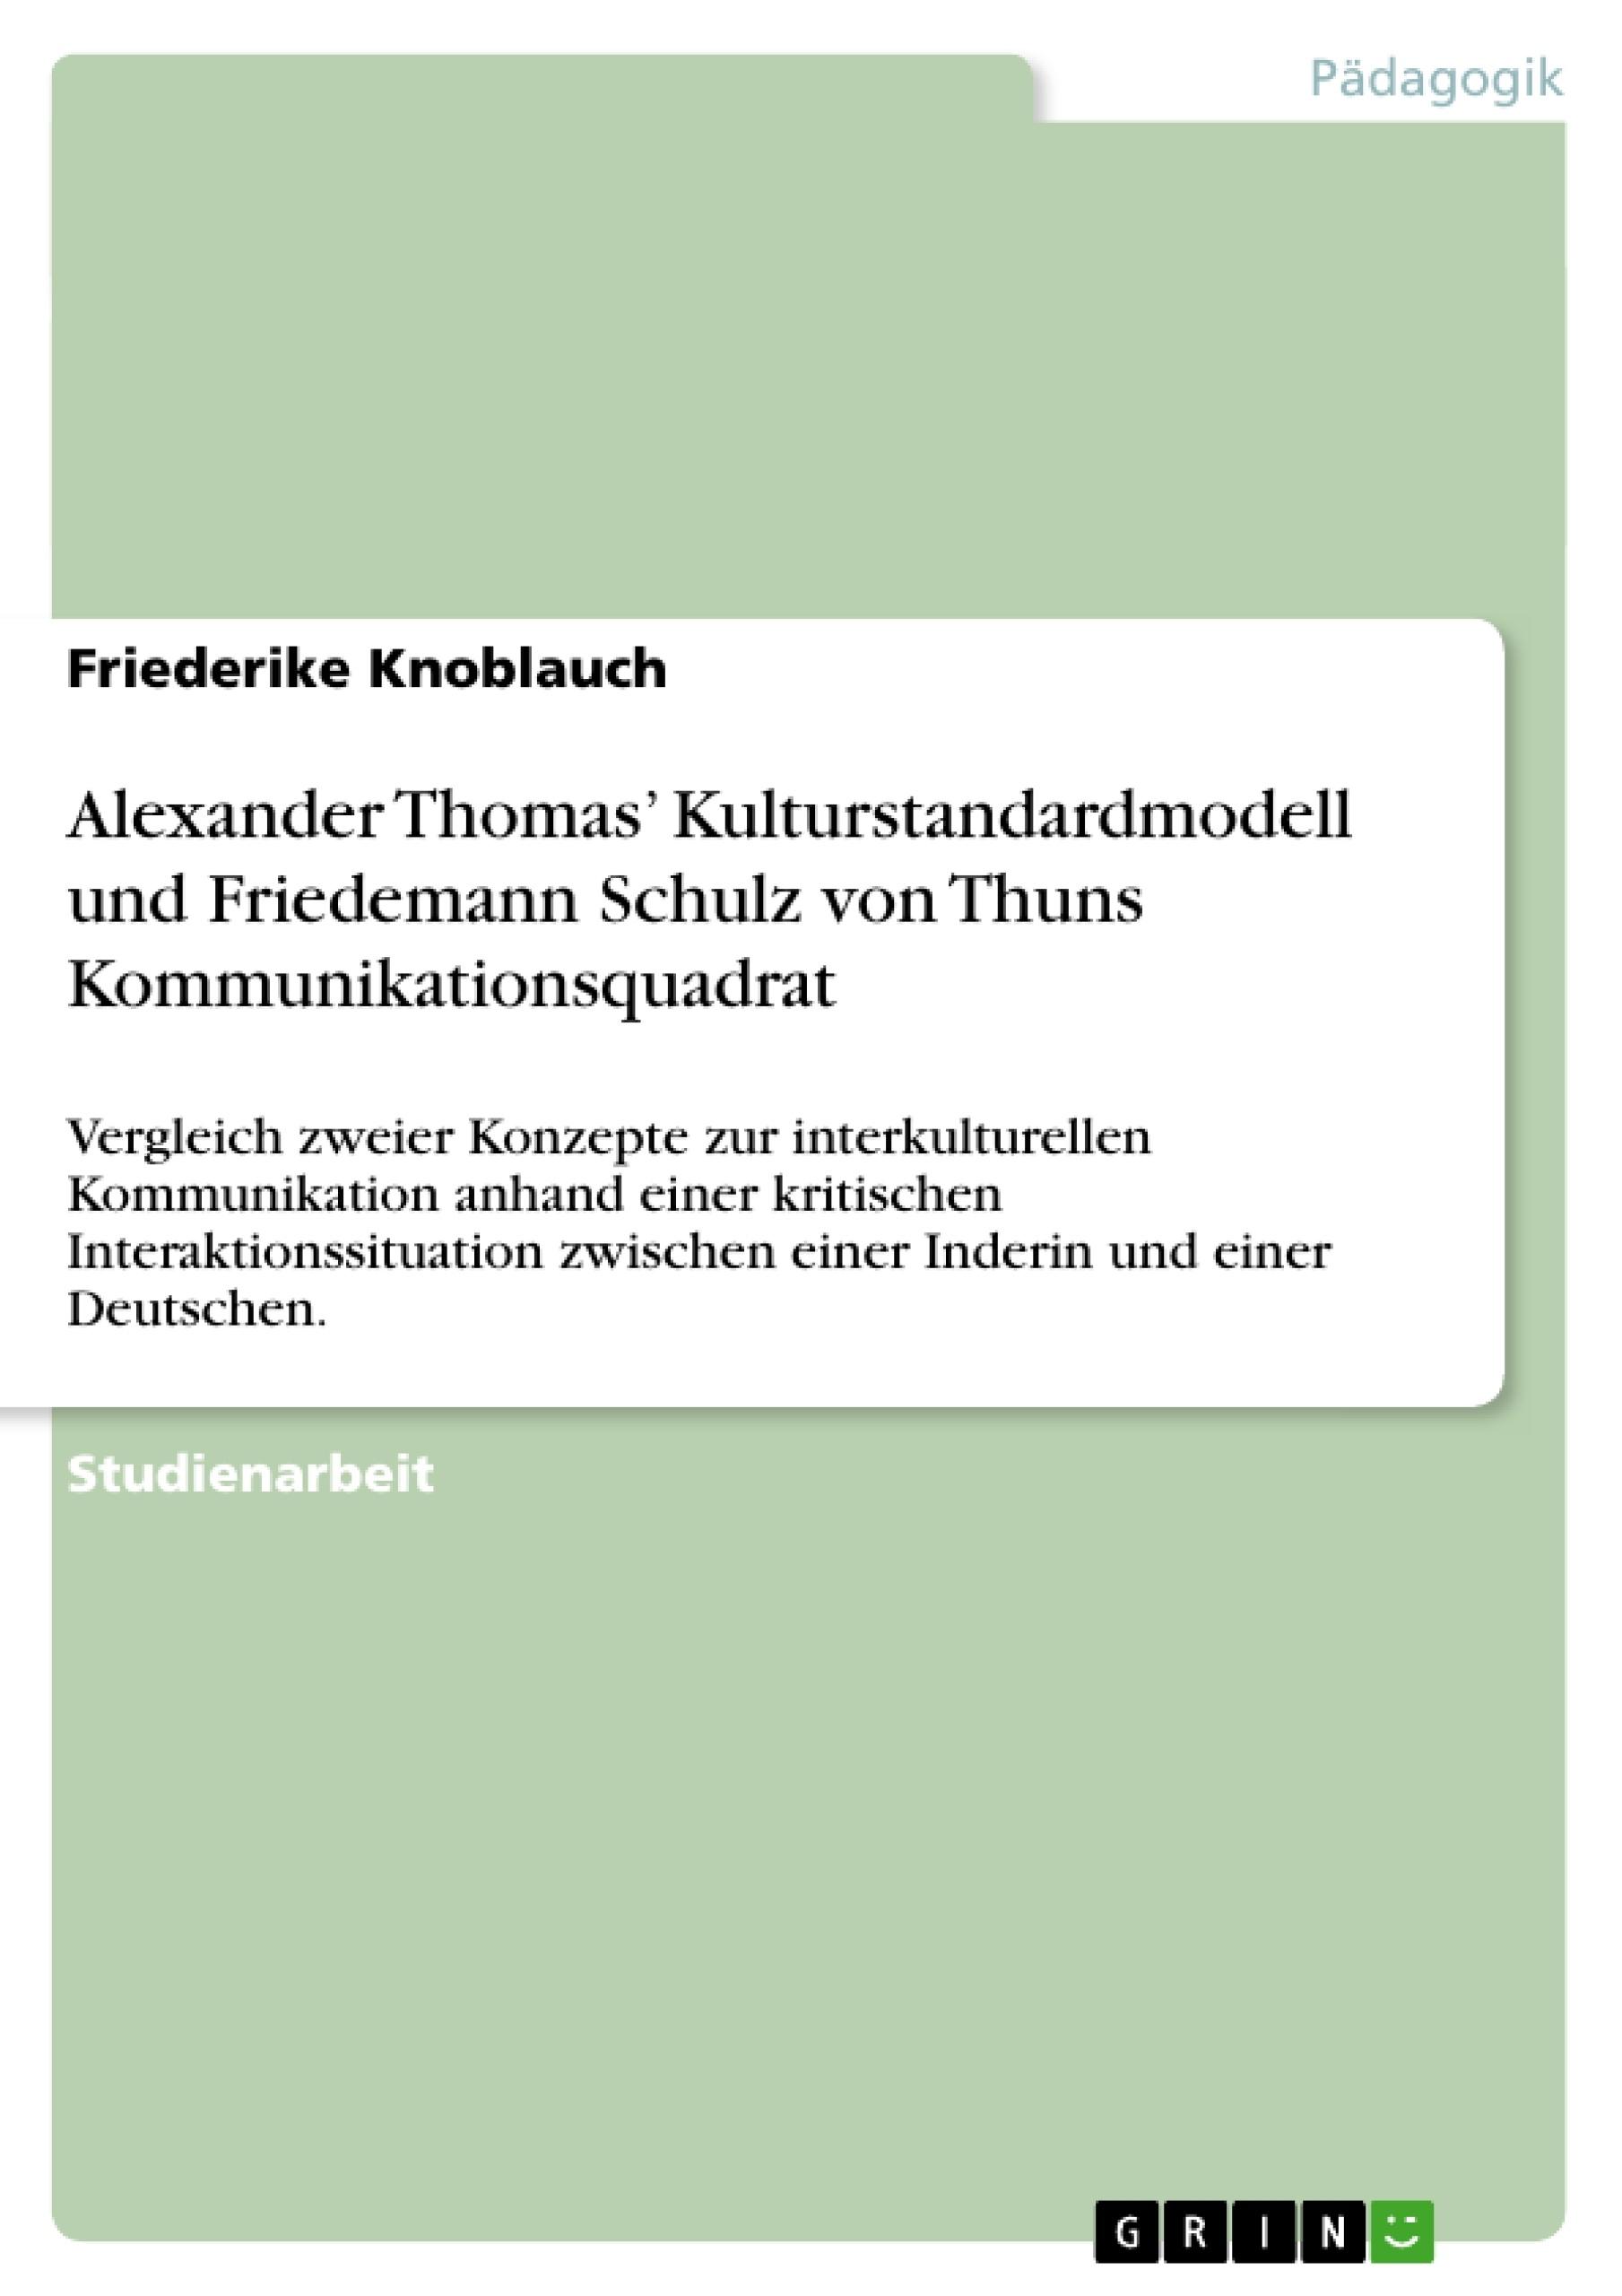 Titel: Alexander Thomas' Kulturstandardmodell und Friedemann Schulz von Thuns Kommunikationsquadrat